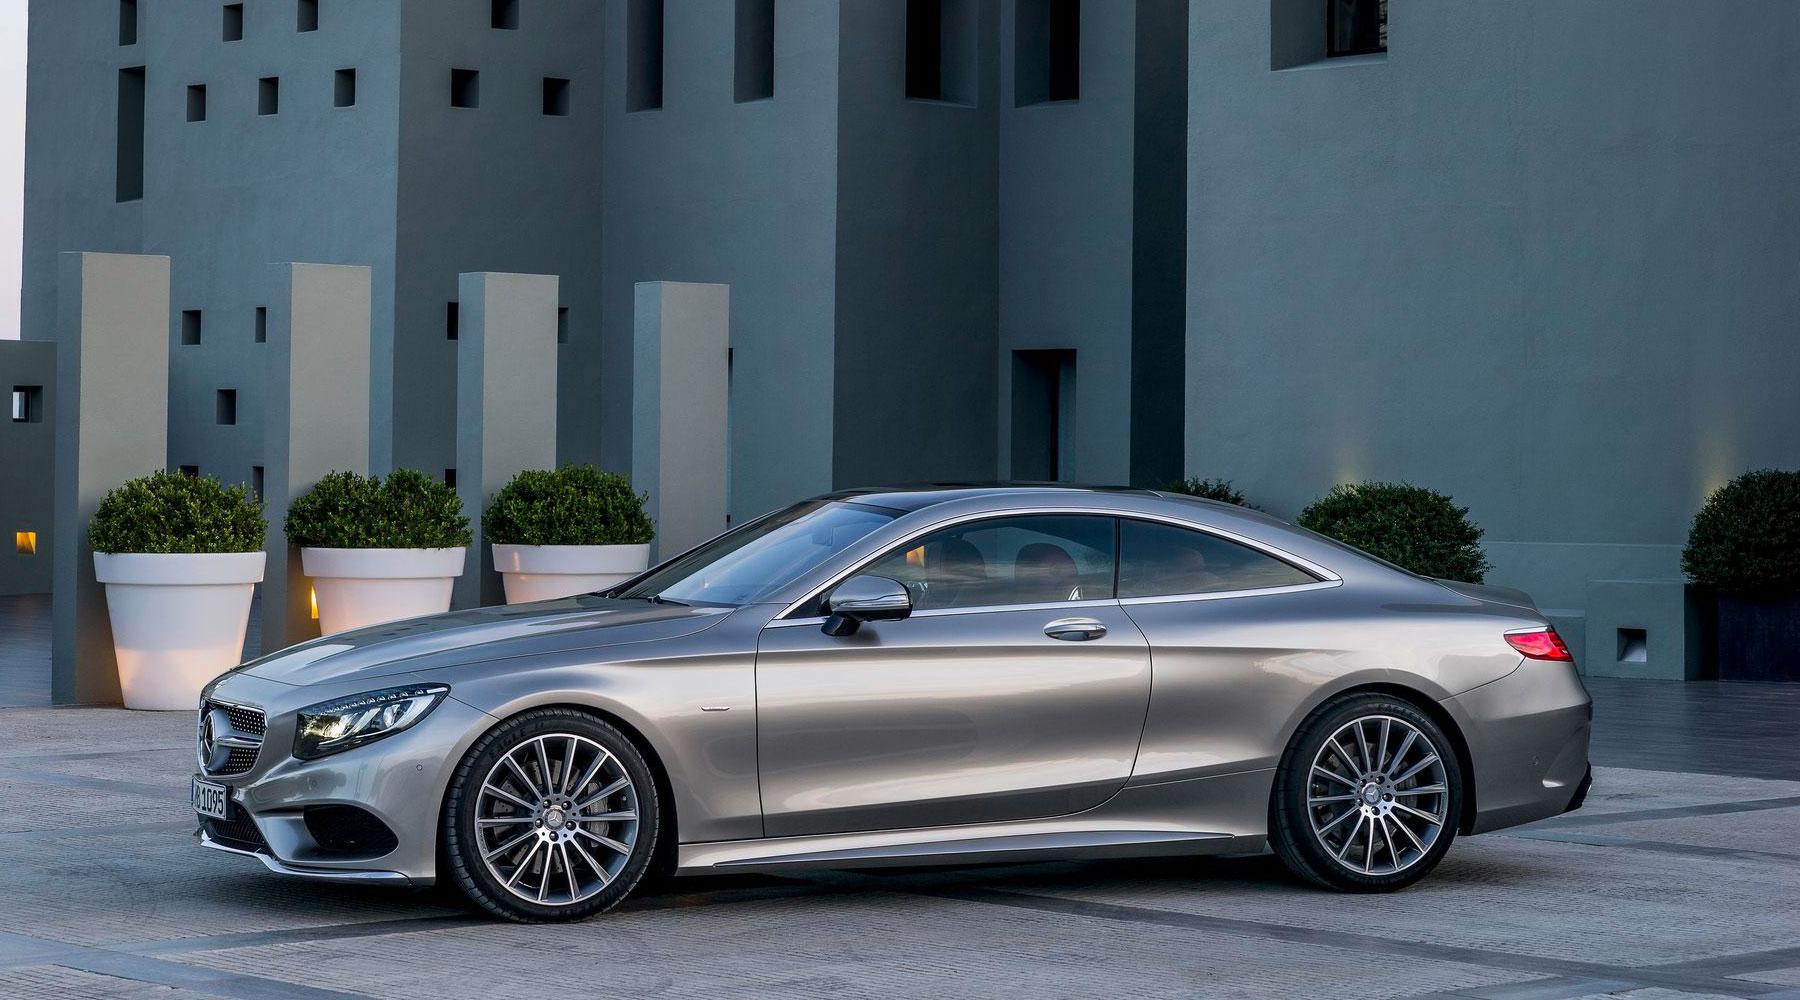 Mercedes benz s serisi coupe 2014 roket araba for Mercedes benz s coupe 2014